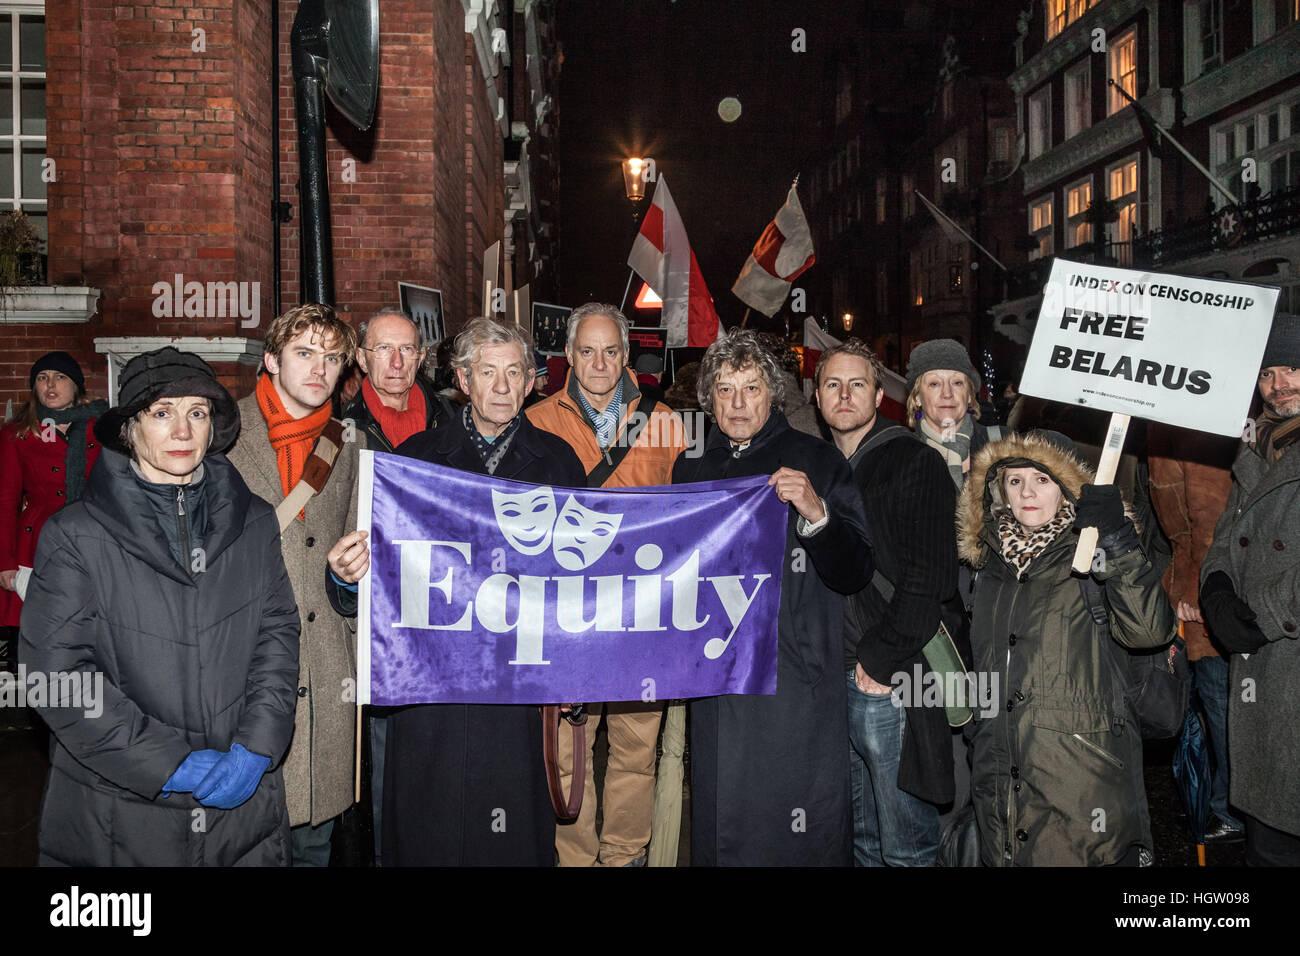 Equity union members (L-R) Harriet Walter, Dan Stevens, Martin Sherman, Ian McKellen, Malcolm Sinclair, Tom Stoppard, - Stock Image